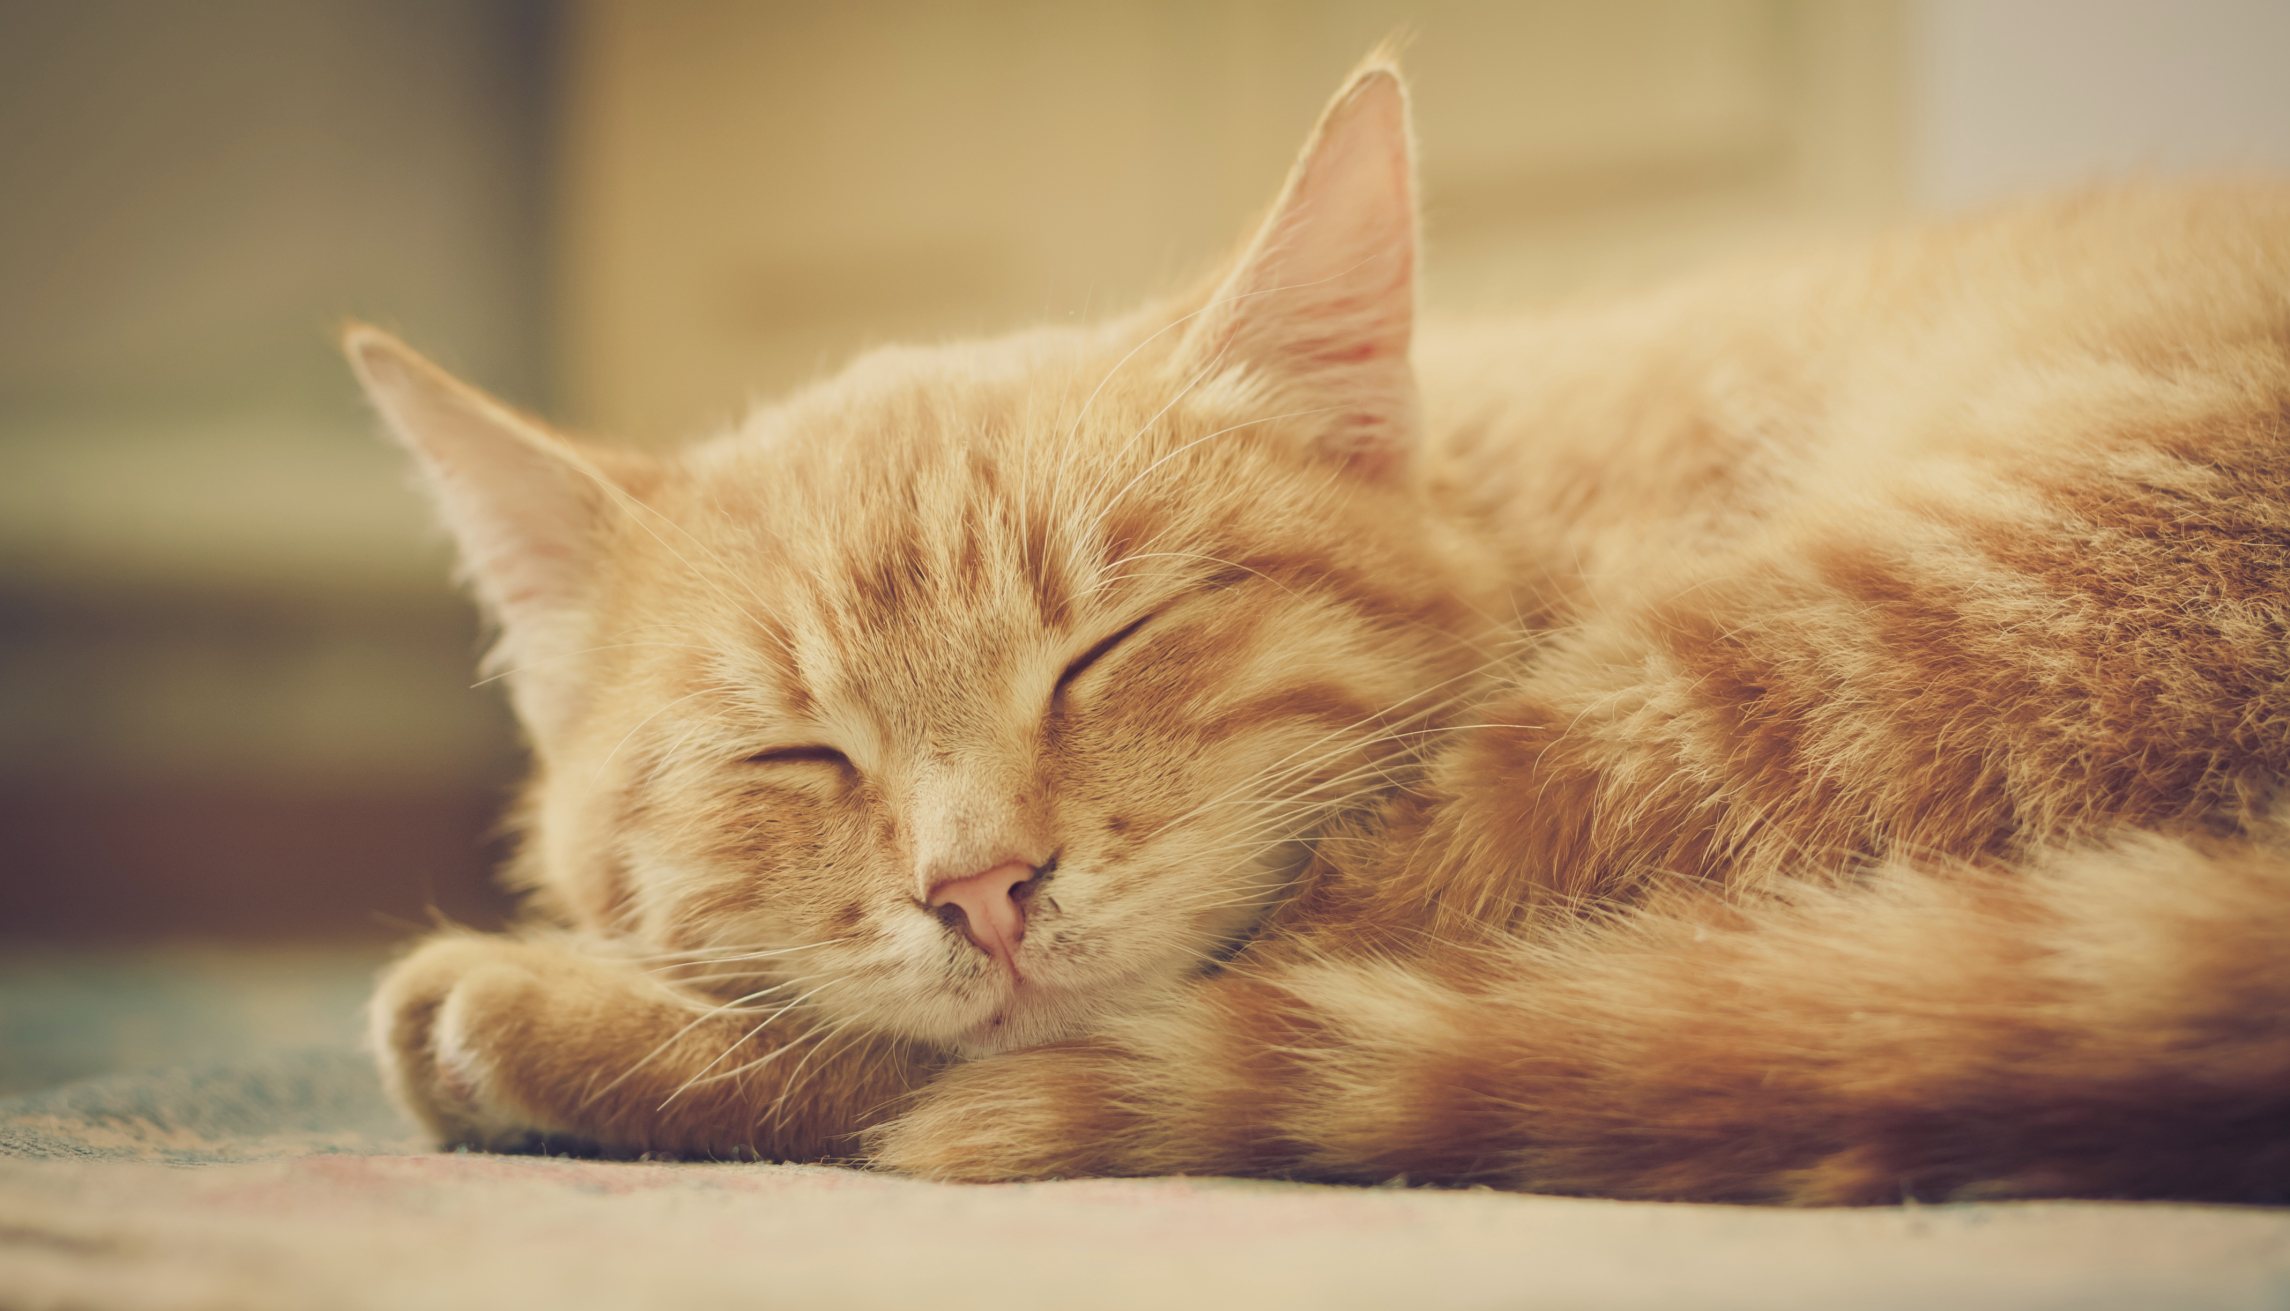 Human Sedatives For Cats